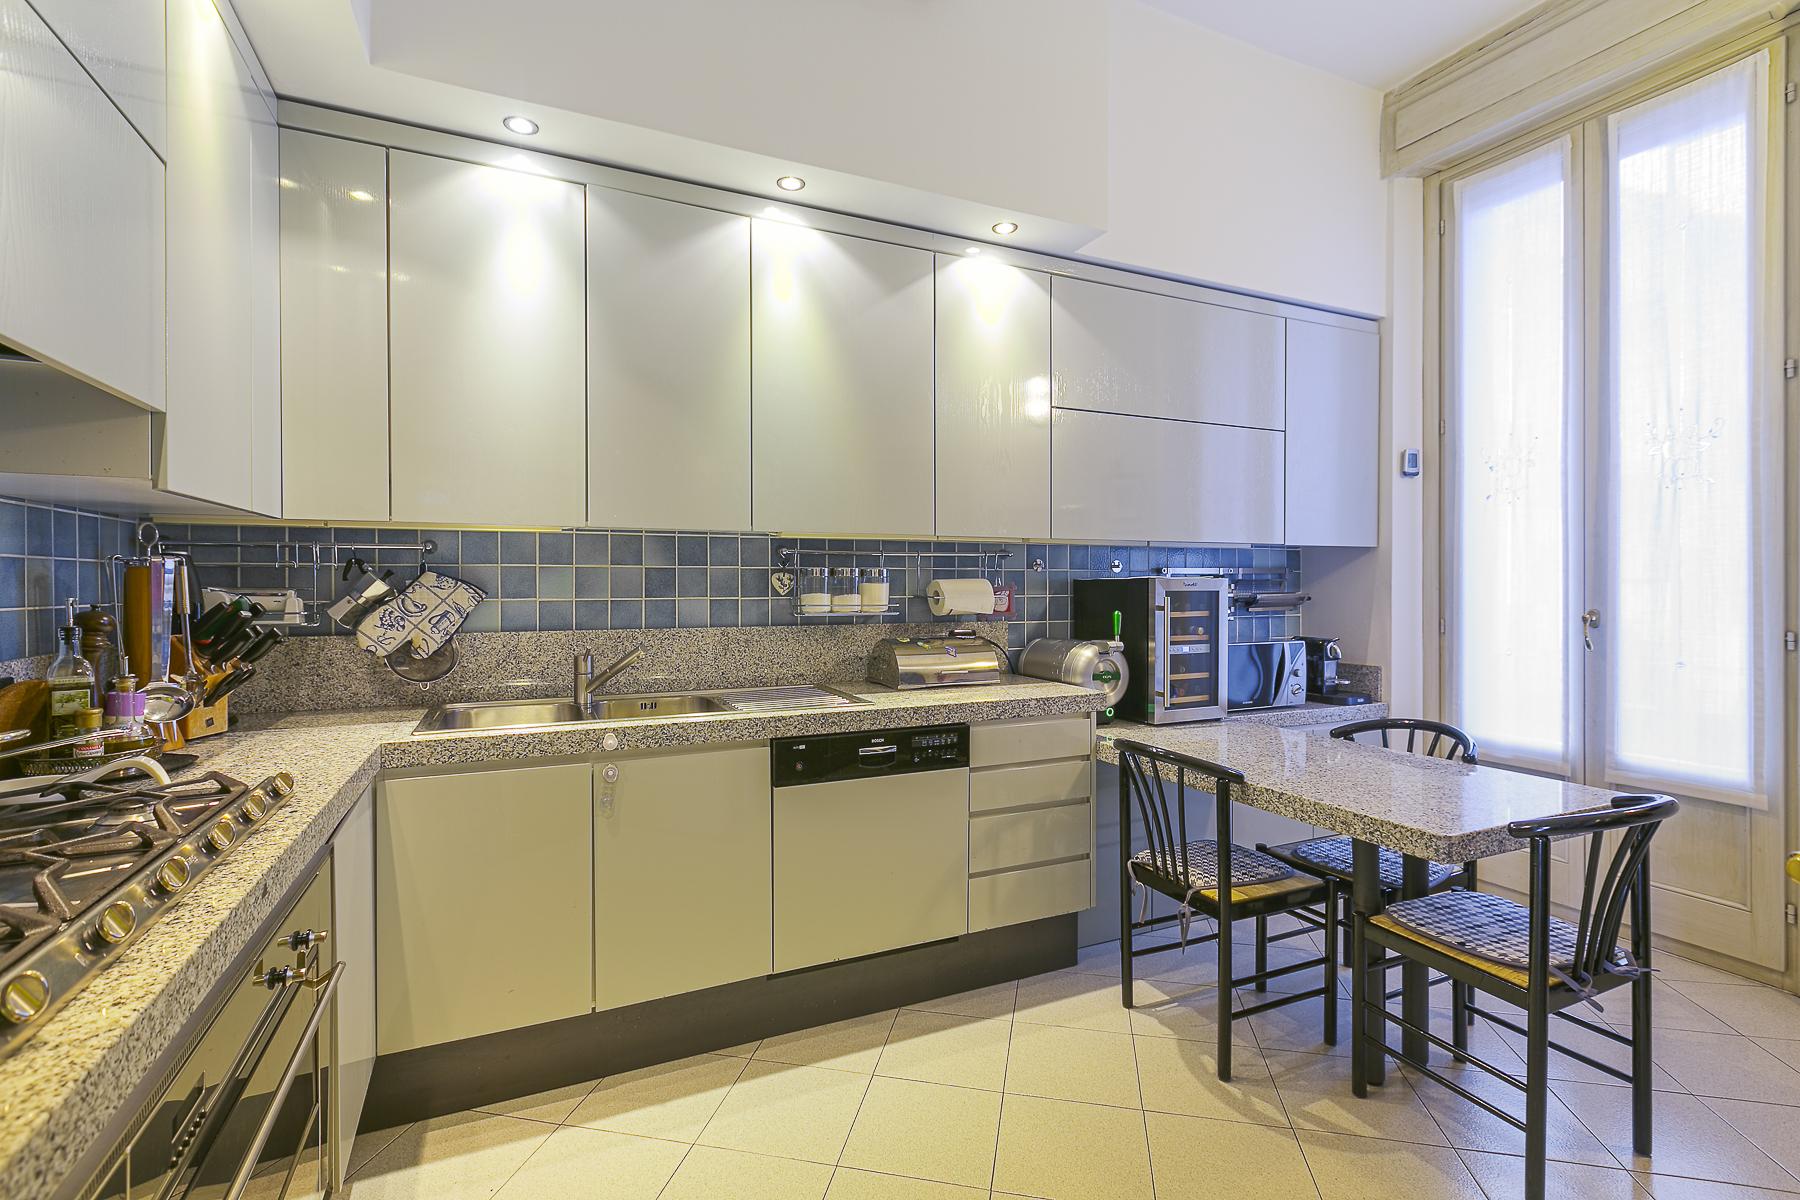 Additional photo for property listing at Splendid apartament in a prestigious building via Cadamosto Milano, Milan 20129 Italy